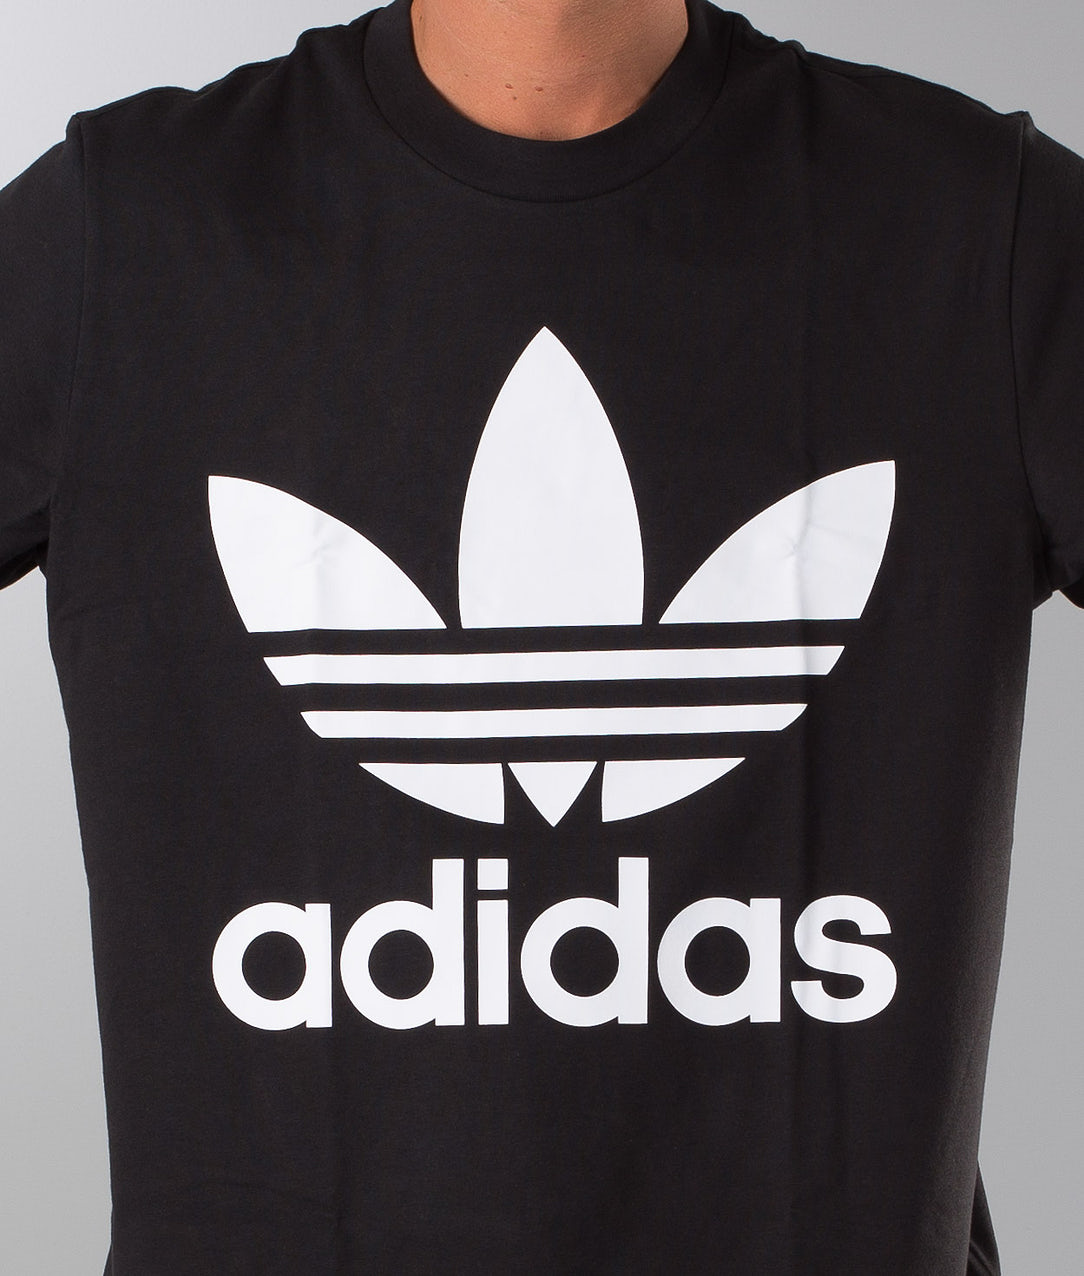 revendeur 0f3db bdd3e Adidas Originals Oversized T-shirt Black